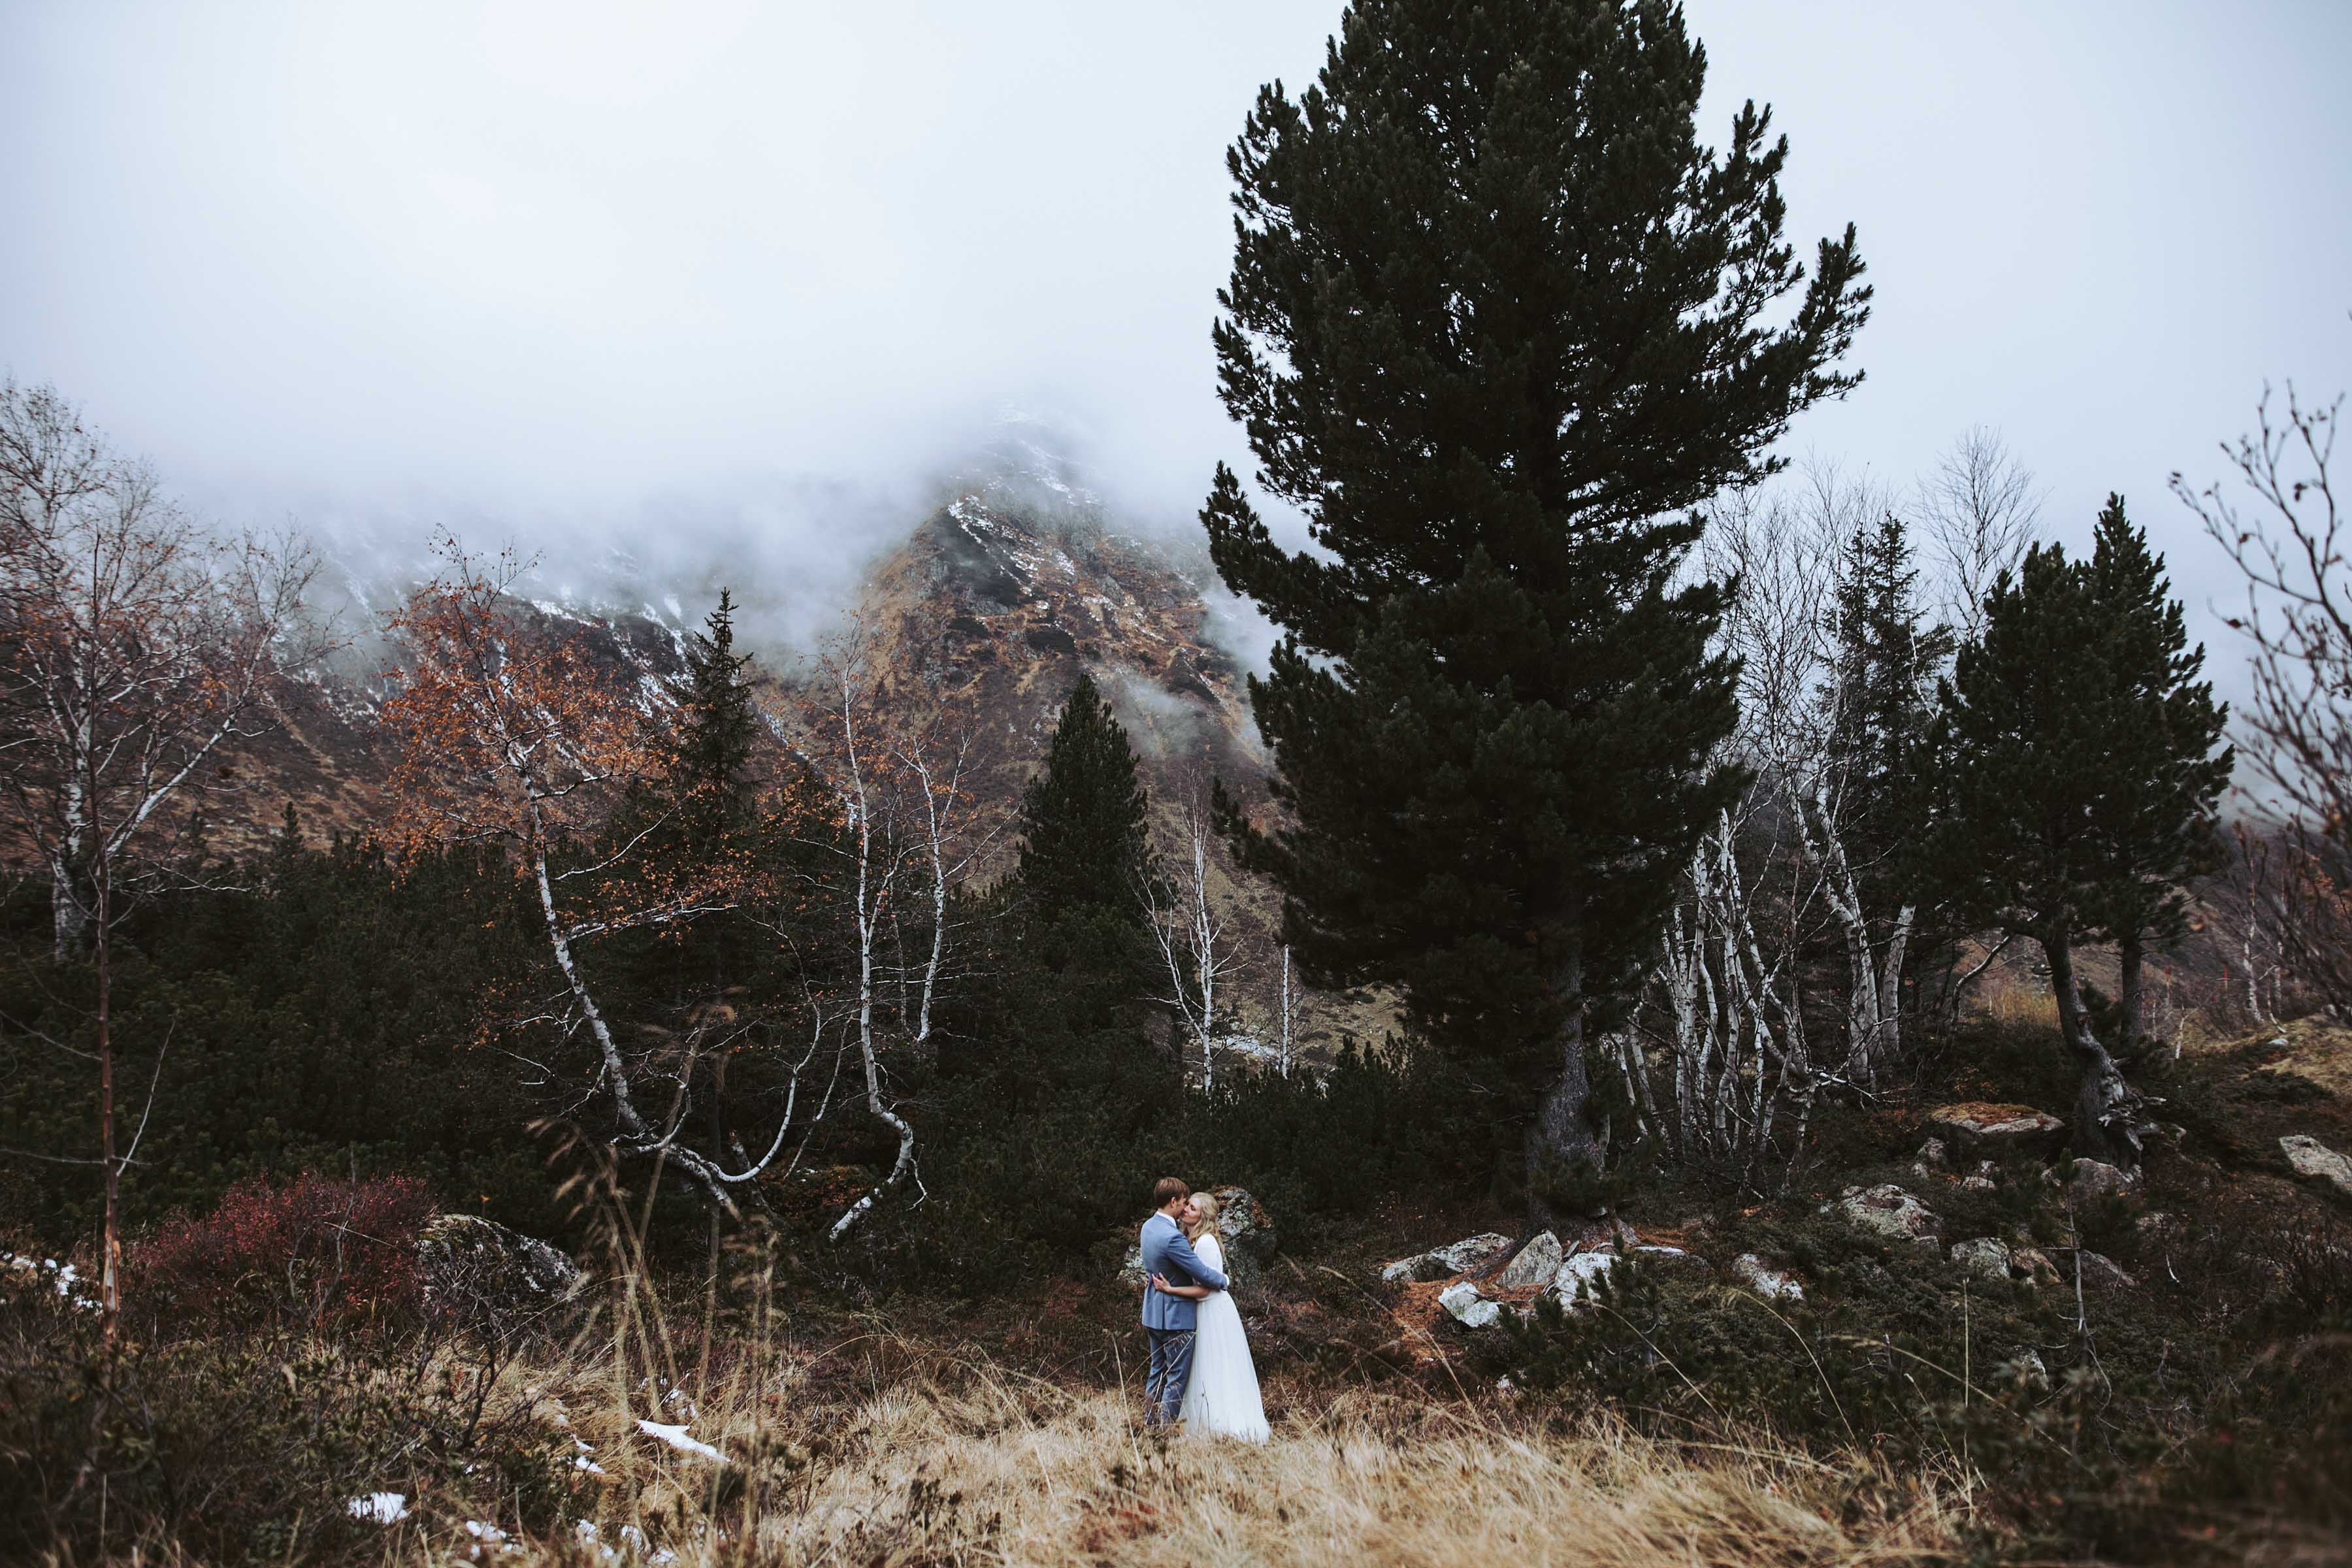 Hochzeitsfotografin Angela Lamprecht